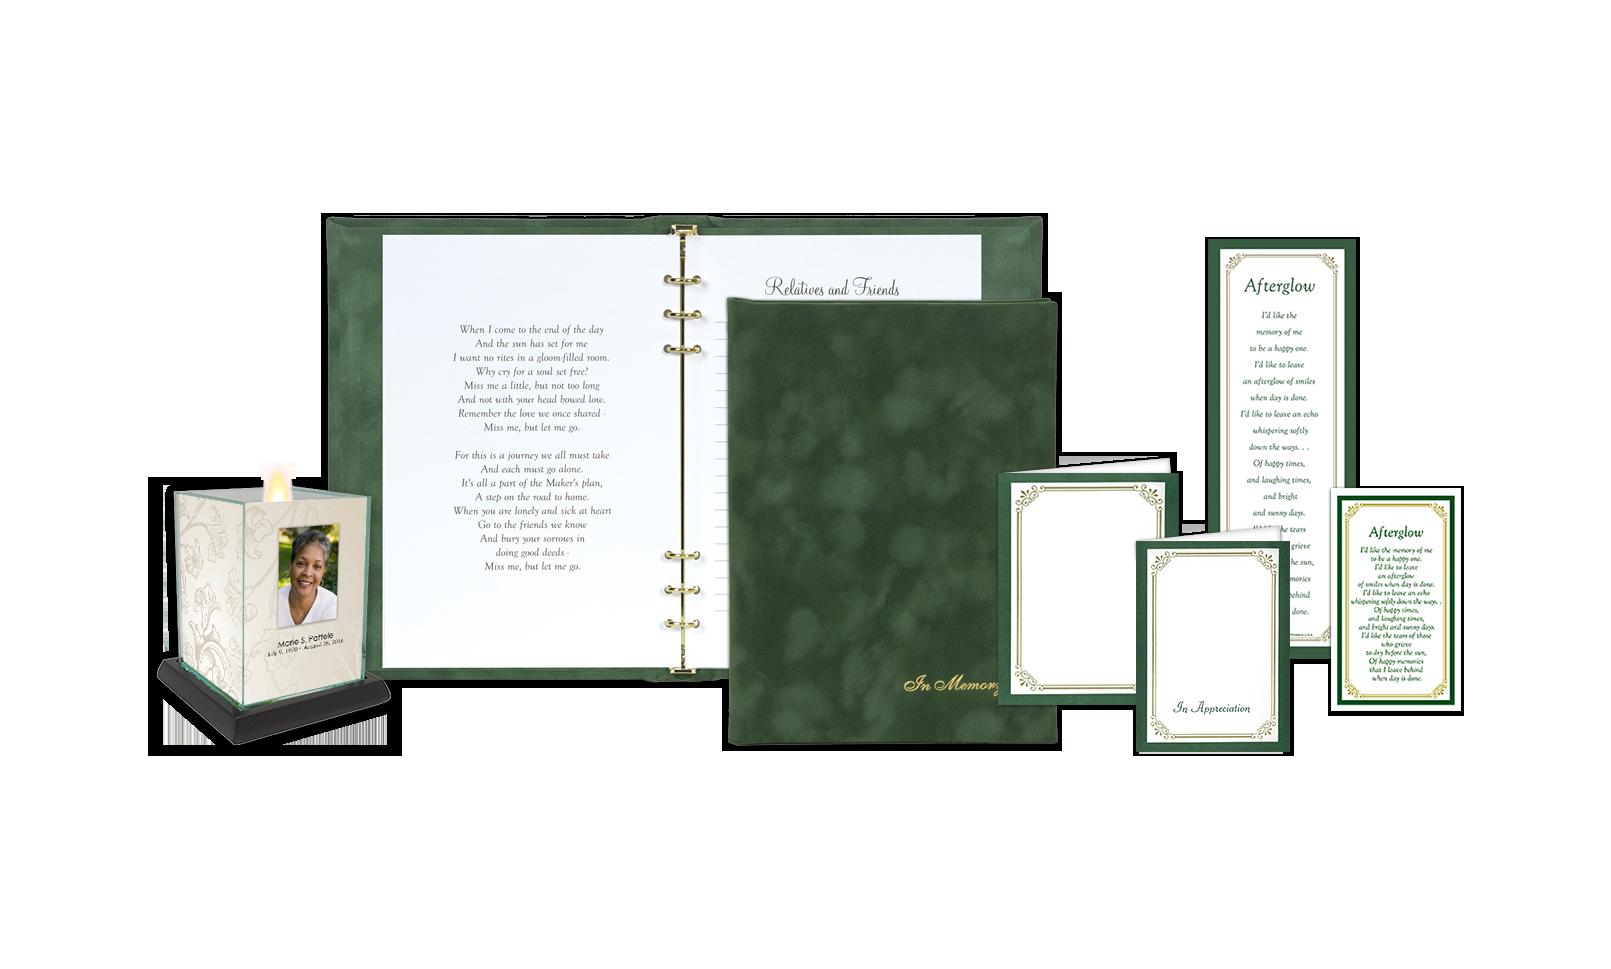 ROL In Memory Suedelux Green Series 507 FS